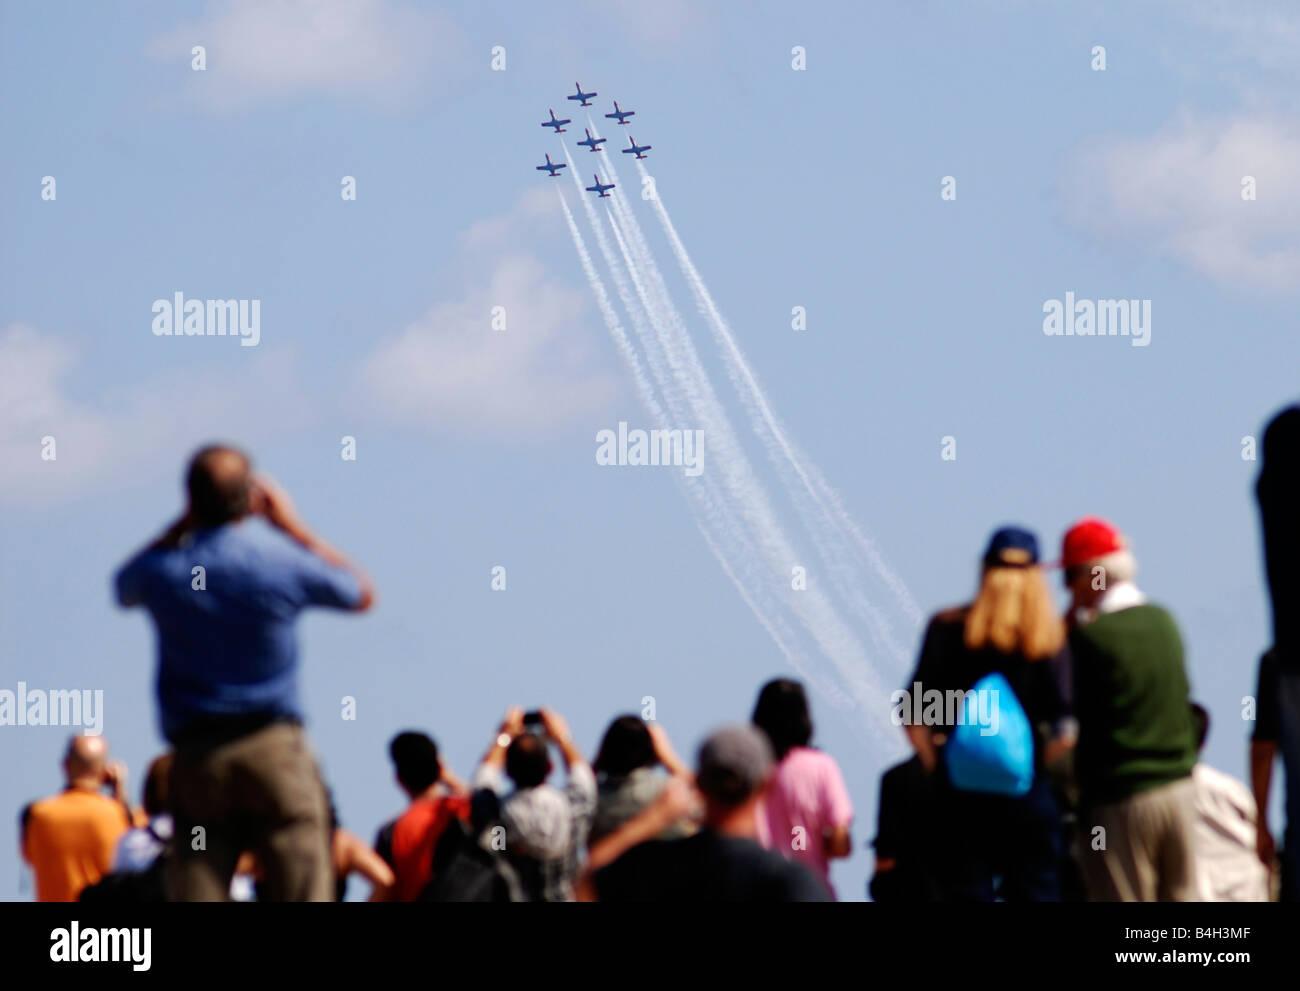 airshow spectators - Stock Image